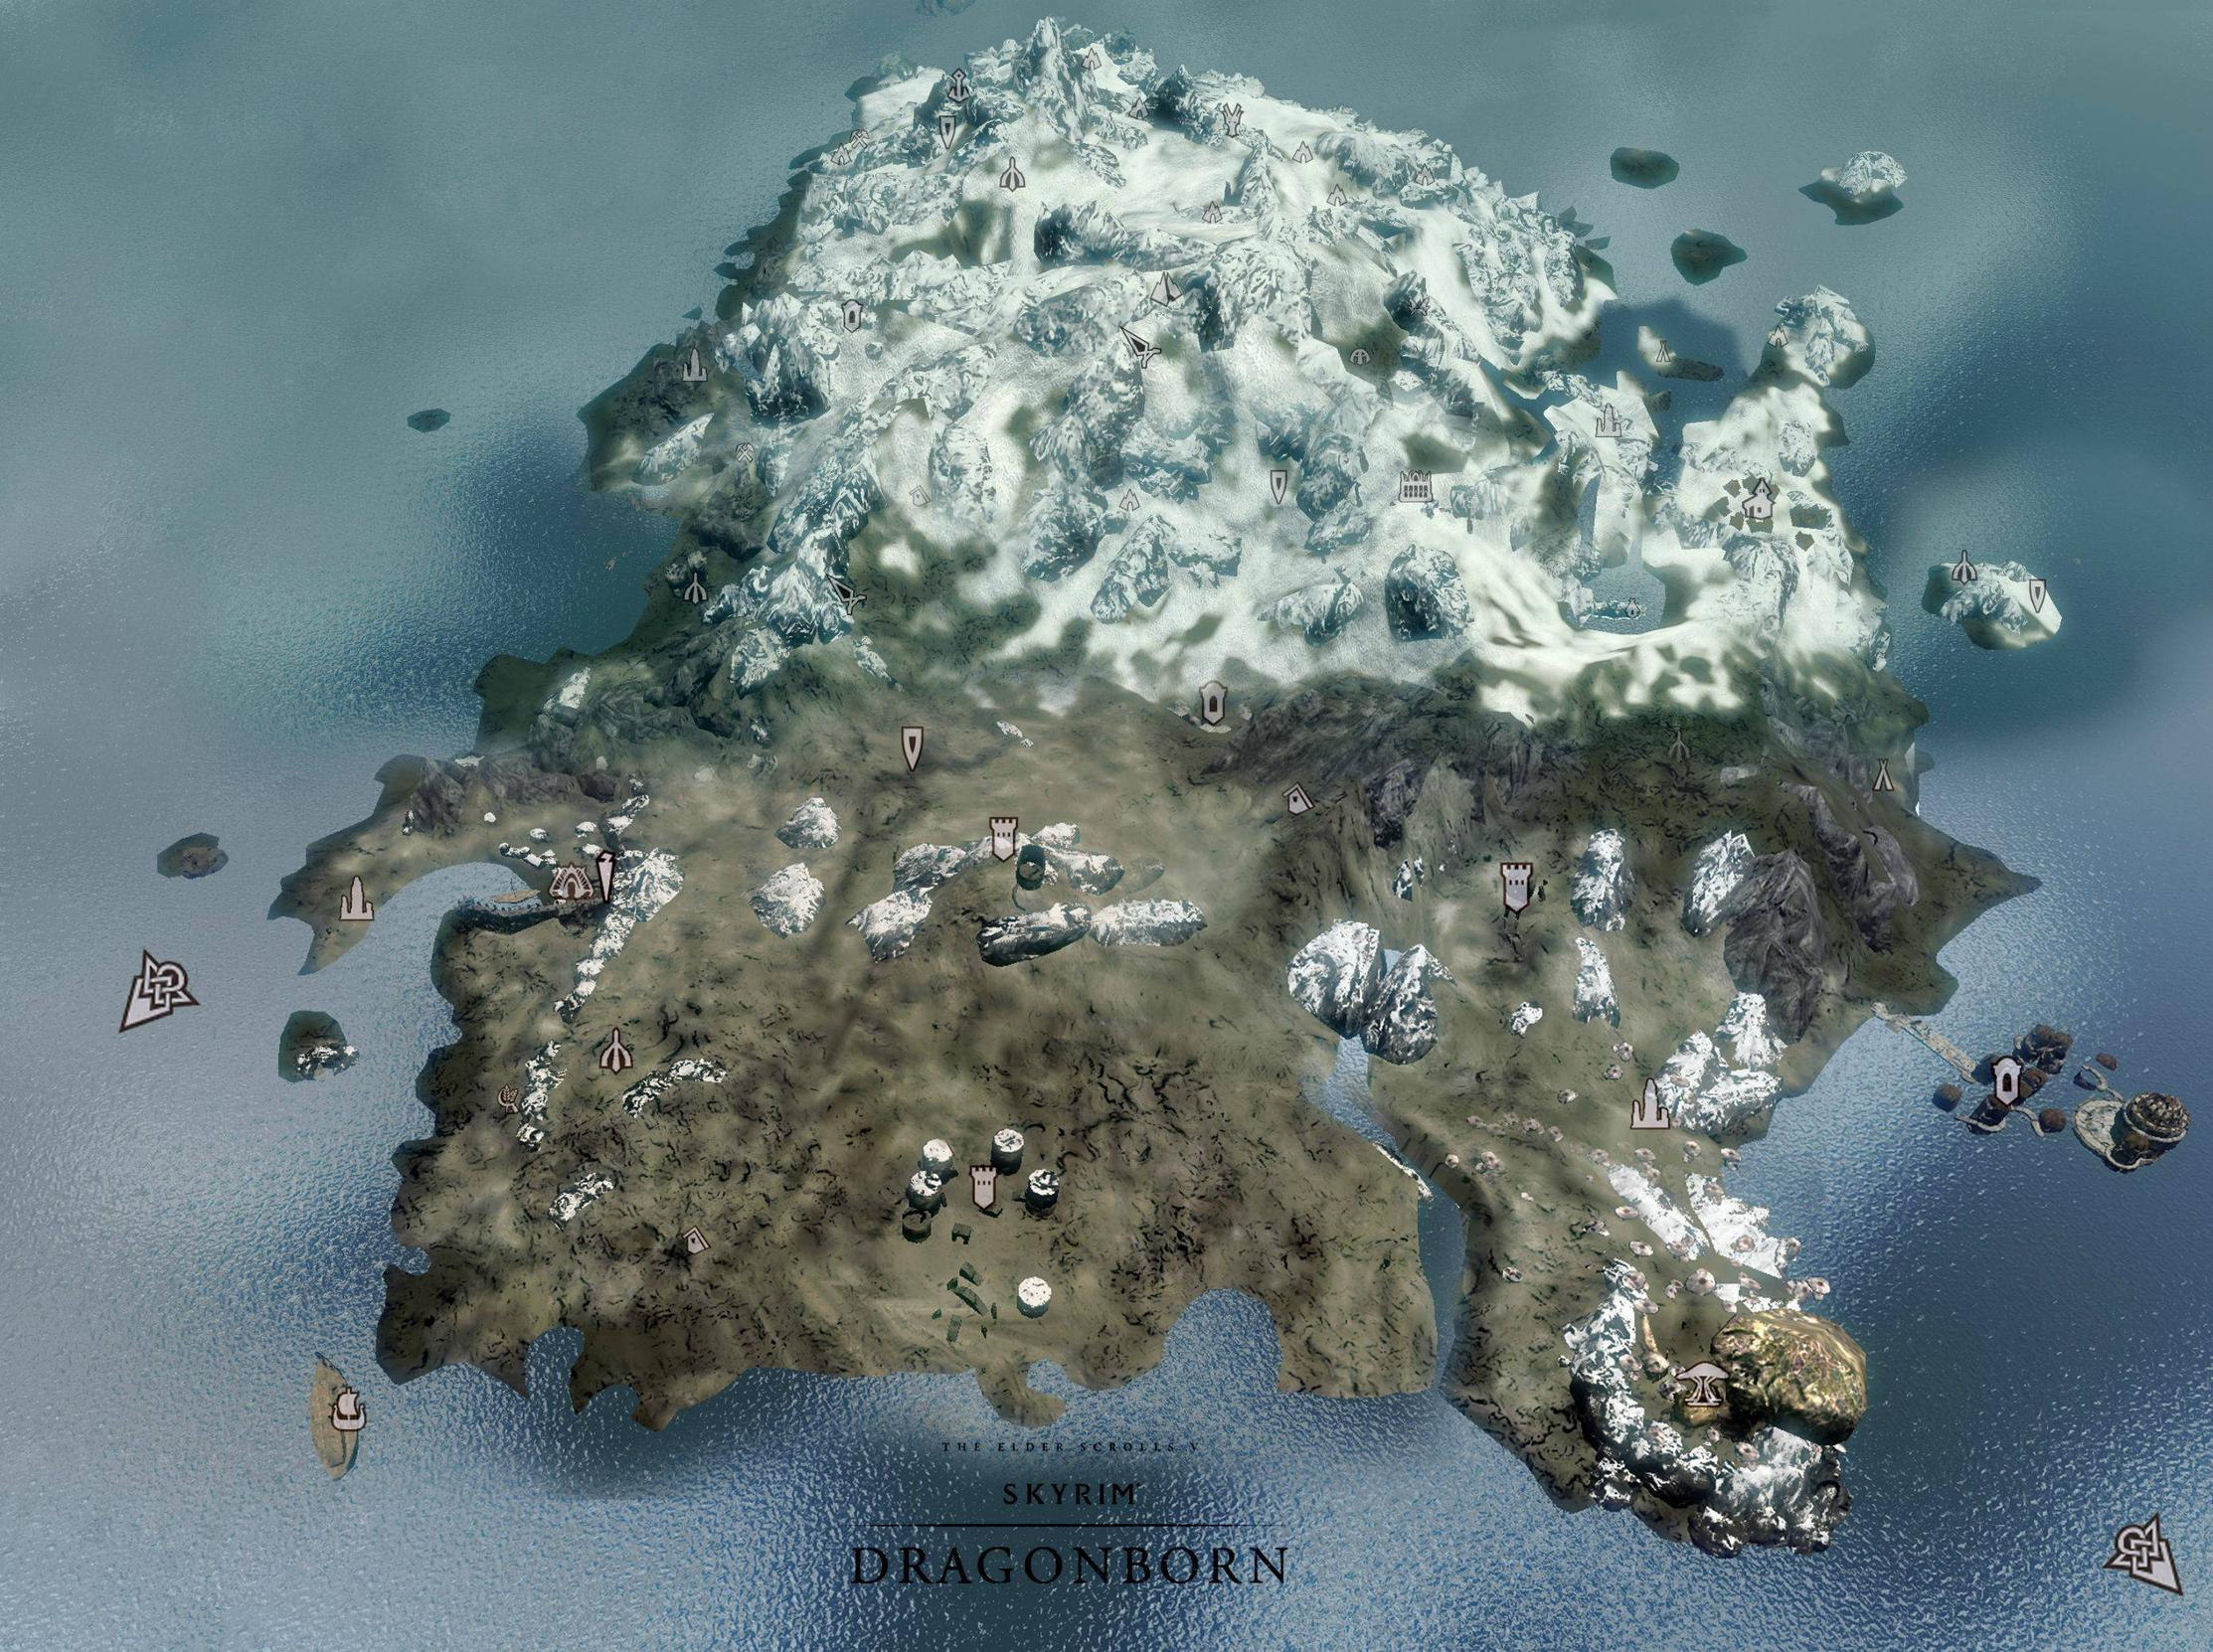 Skyrim Solstheim Map Solstheim (Dragonborn) | Elder Scrolls | FANDOM powered by Wikia